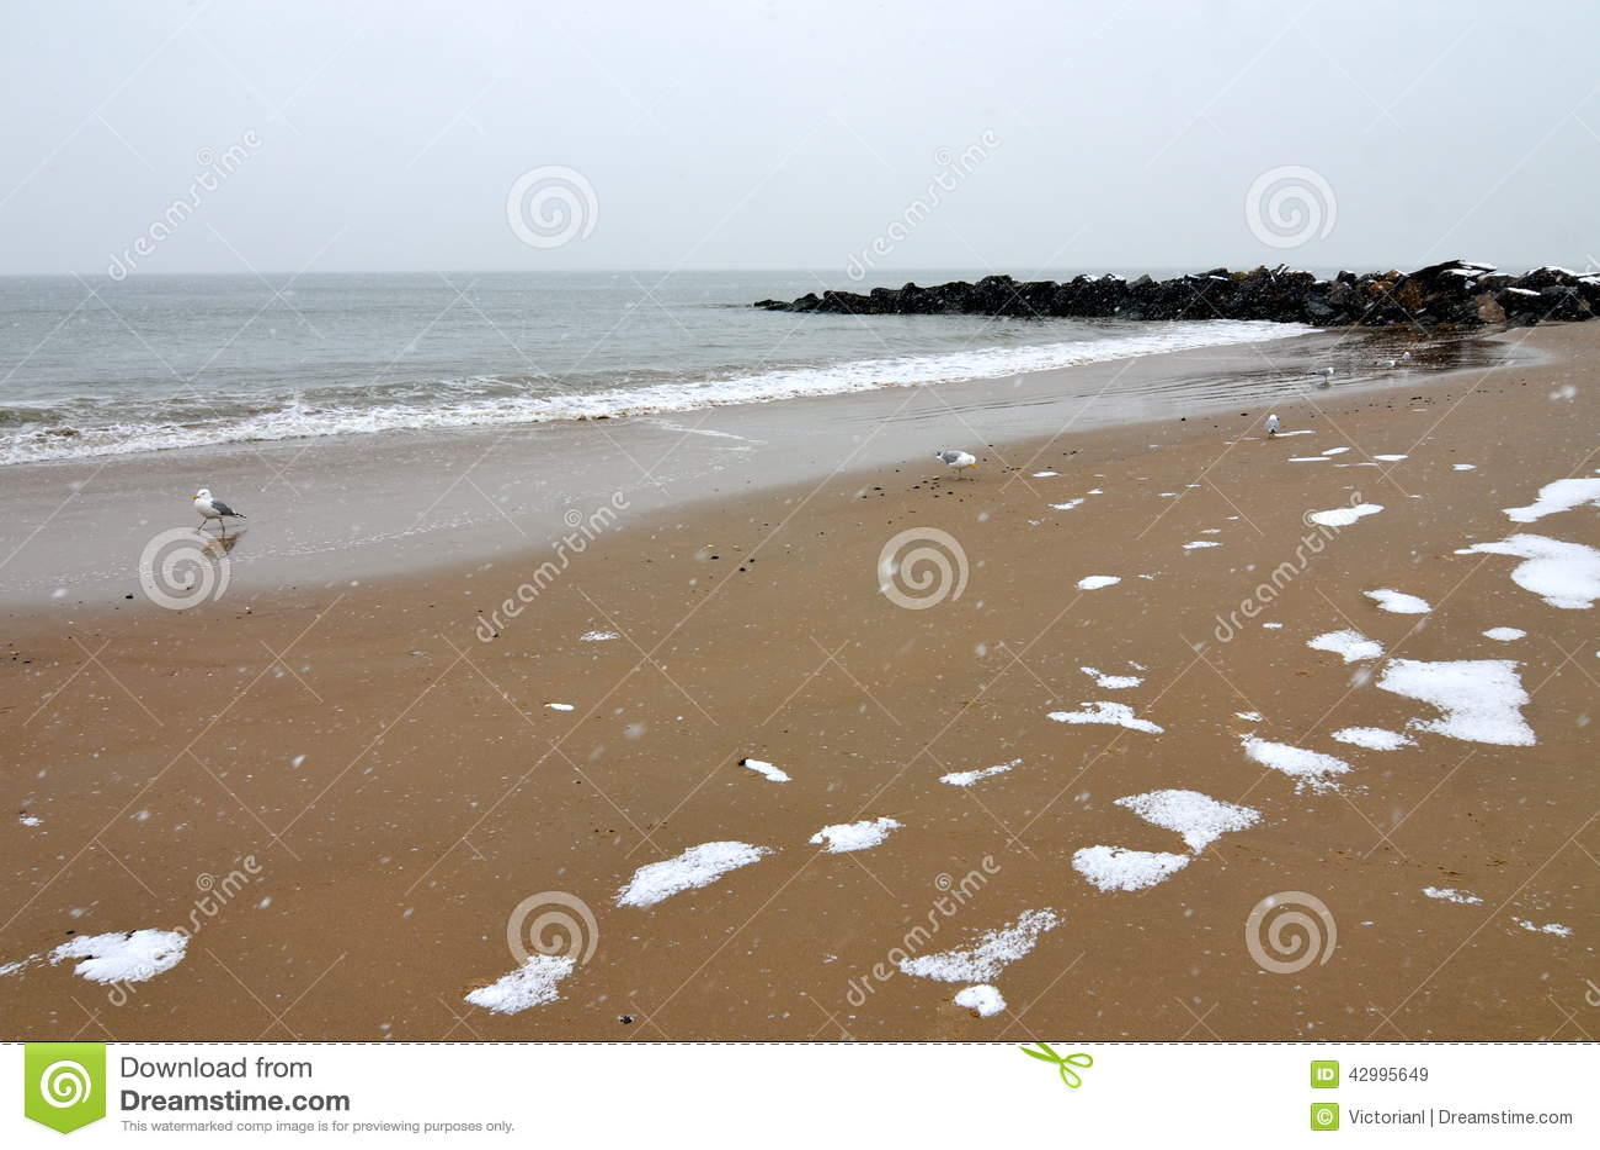 Ocean from Brighton Beach in the winter, New York.